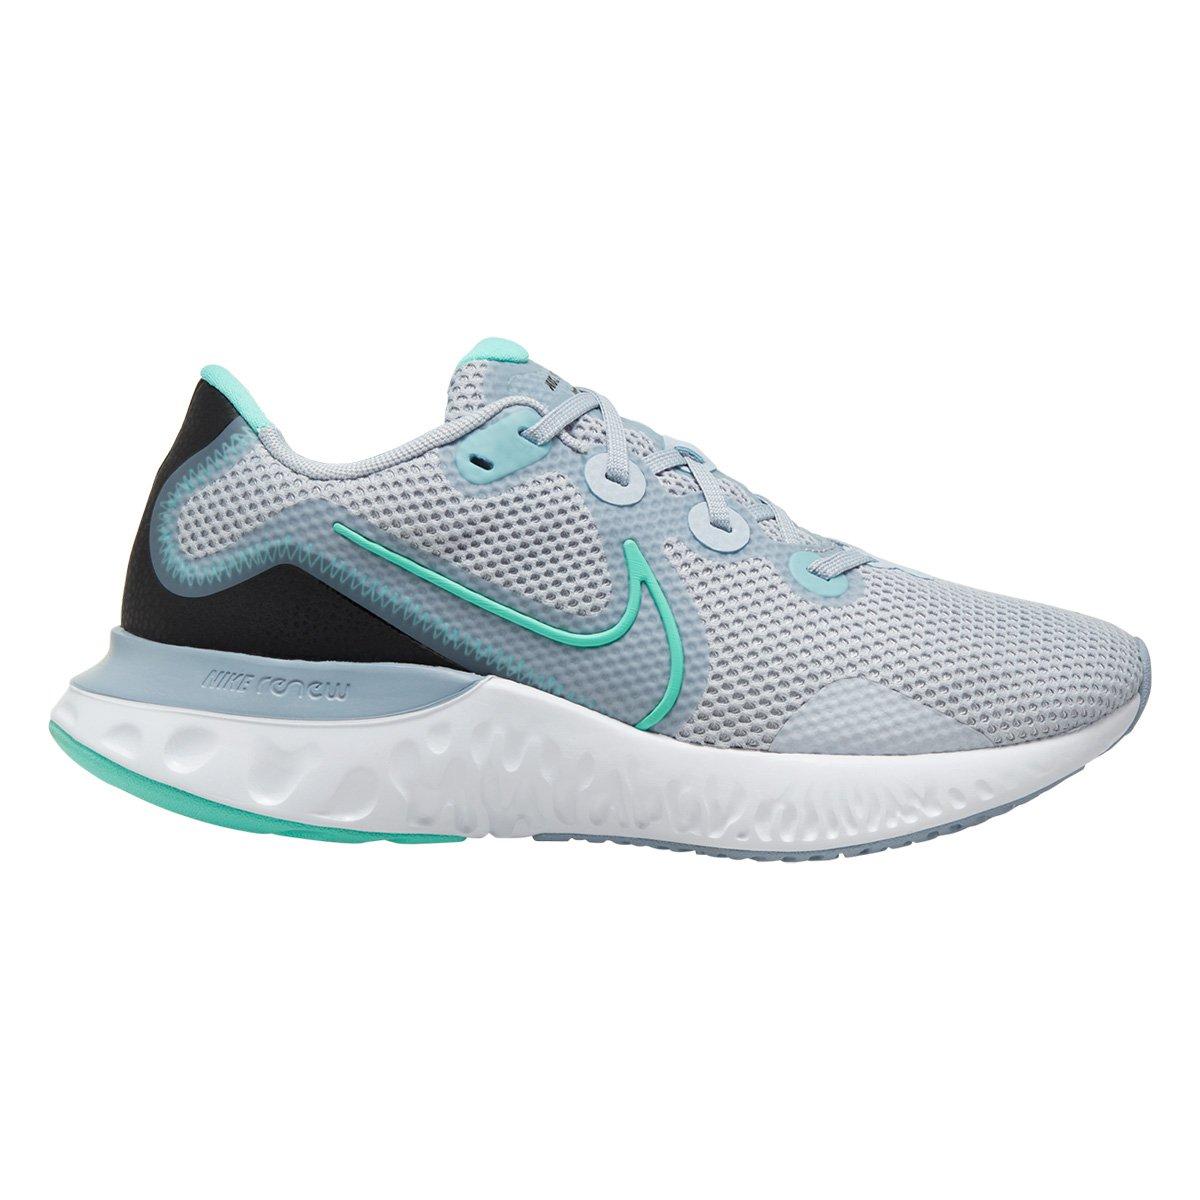 Ale paperback Stabilire  Tênis Nike Renew Run Feminino - Cinza e Azul Claro | Allianz Parque Shop